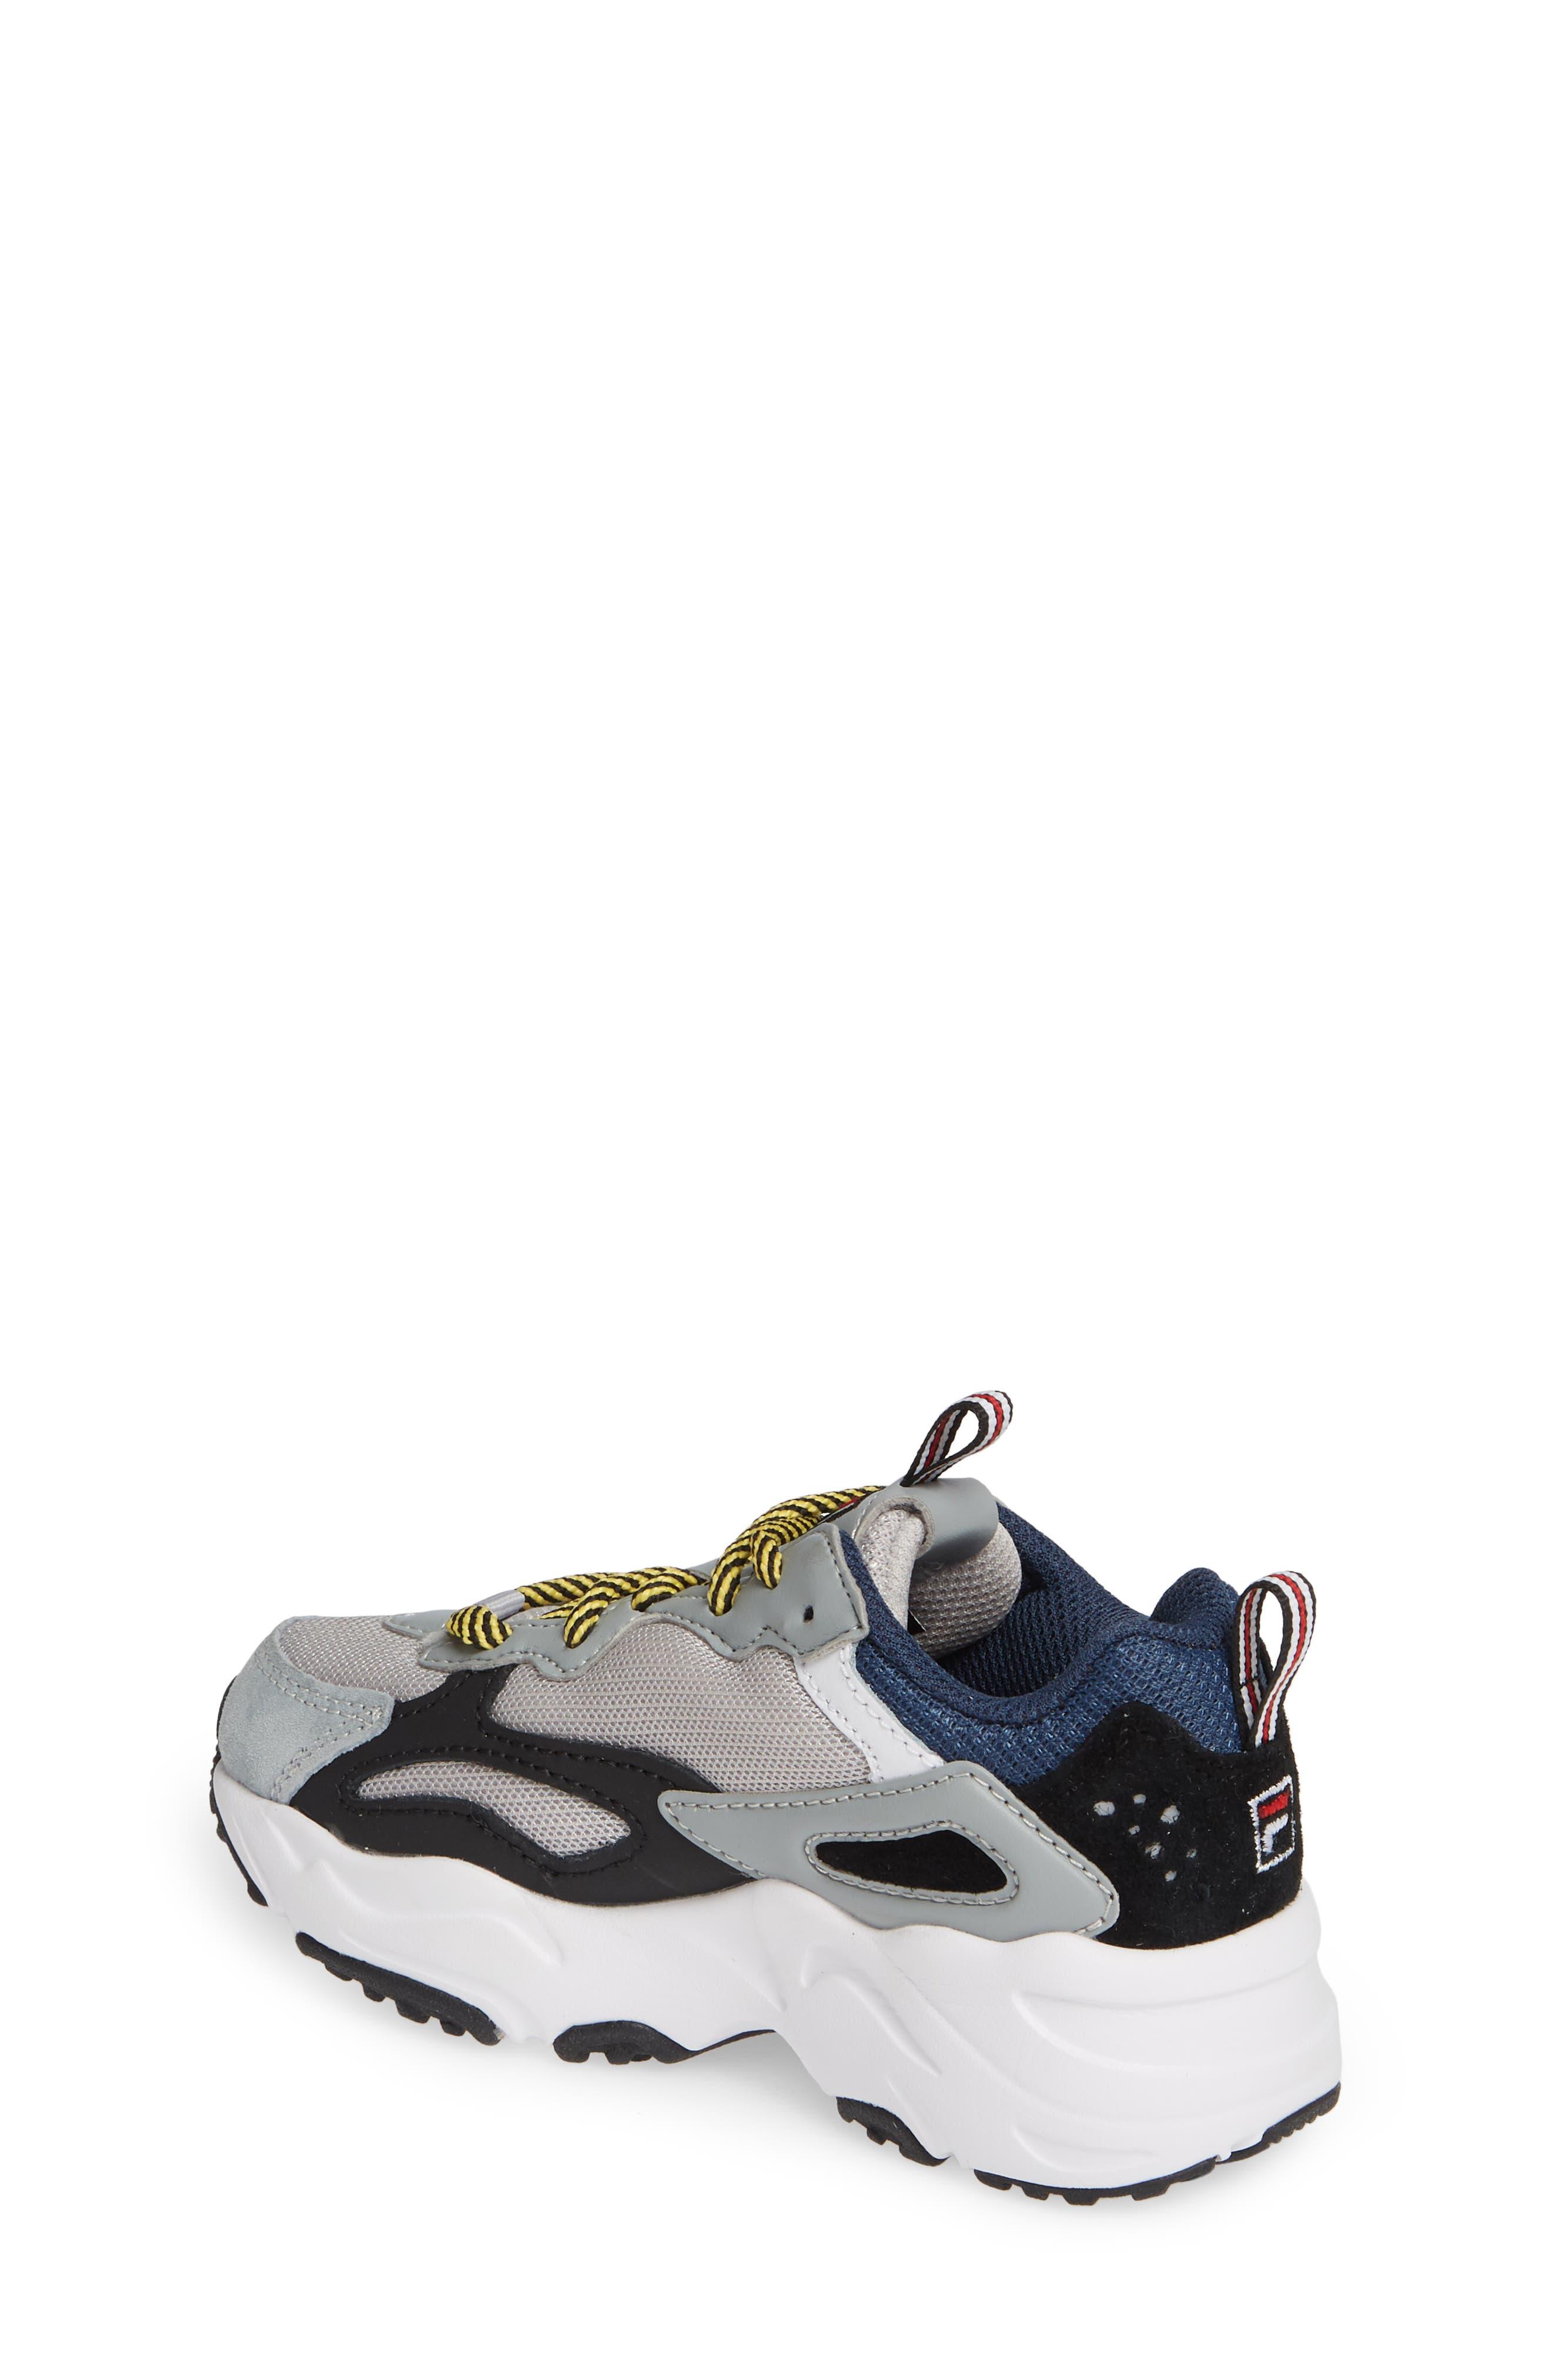 FILA, Ray Tracer Sneaker, Alternate thumbnail 2, color, VAPOR BLUE/ HIGHRISE/ BLACK